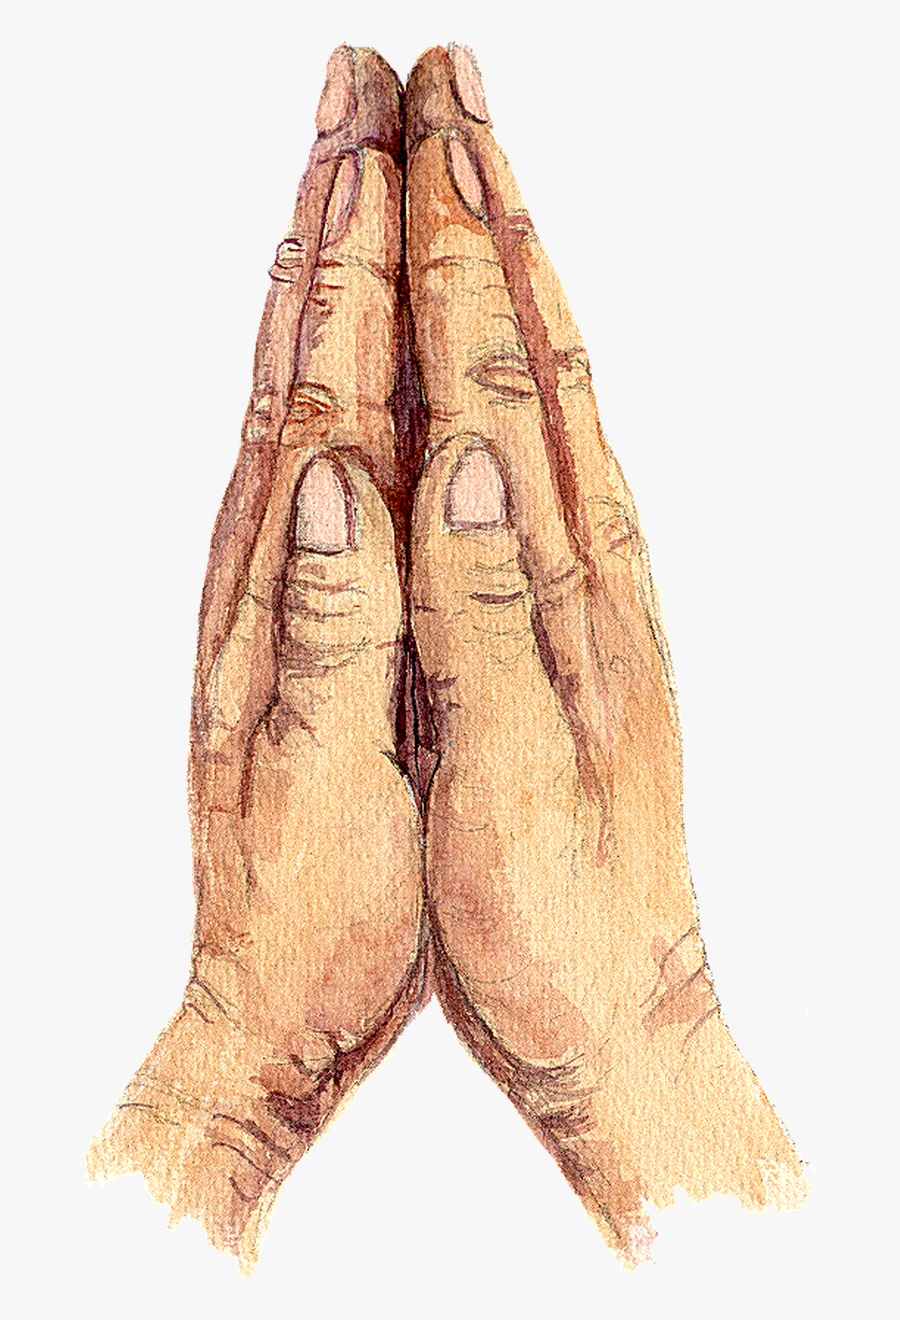 Praying Clipart Transparent Background Png Freeuse - Background Transparent Background Prayer Hand, Transparent Clipart